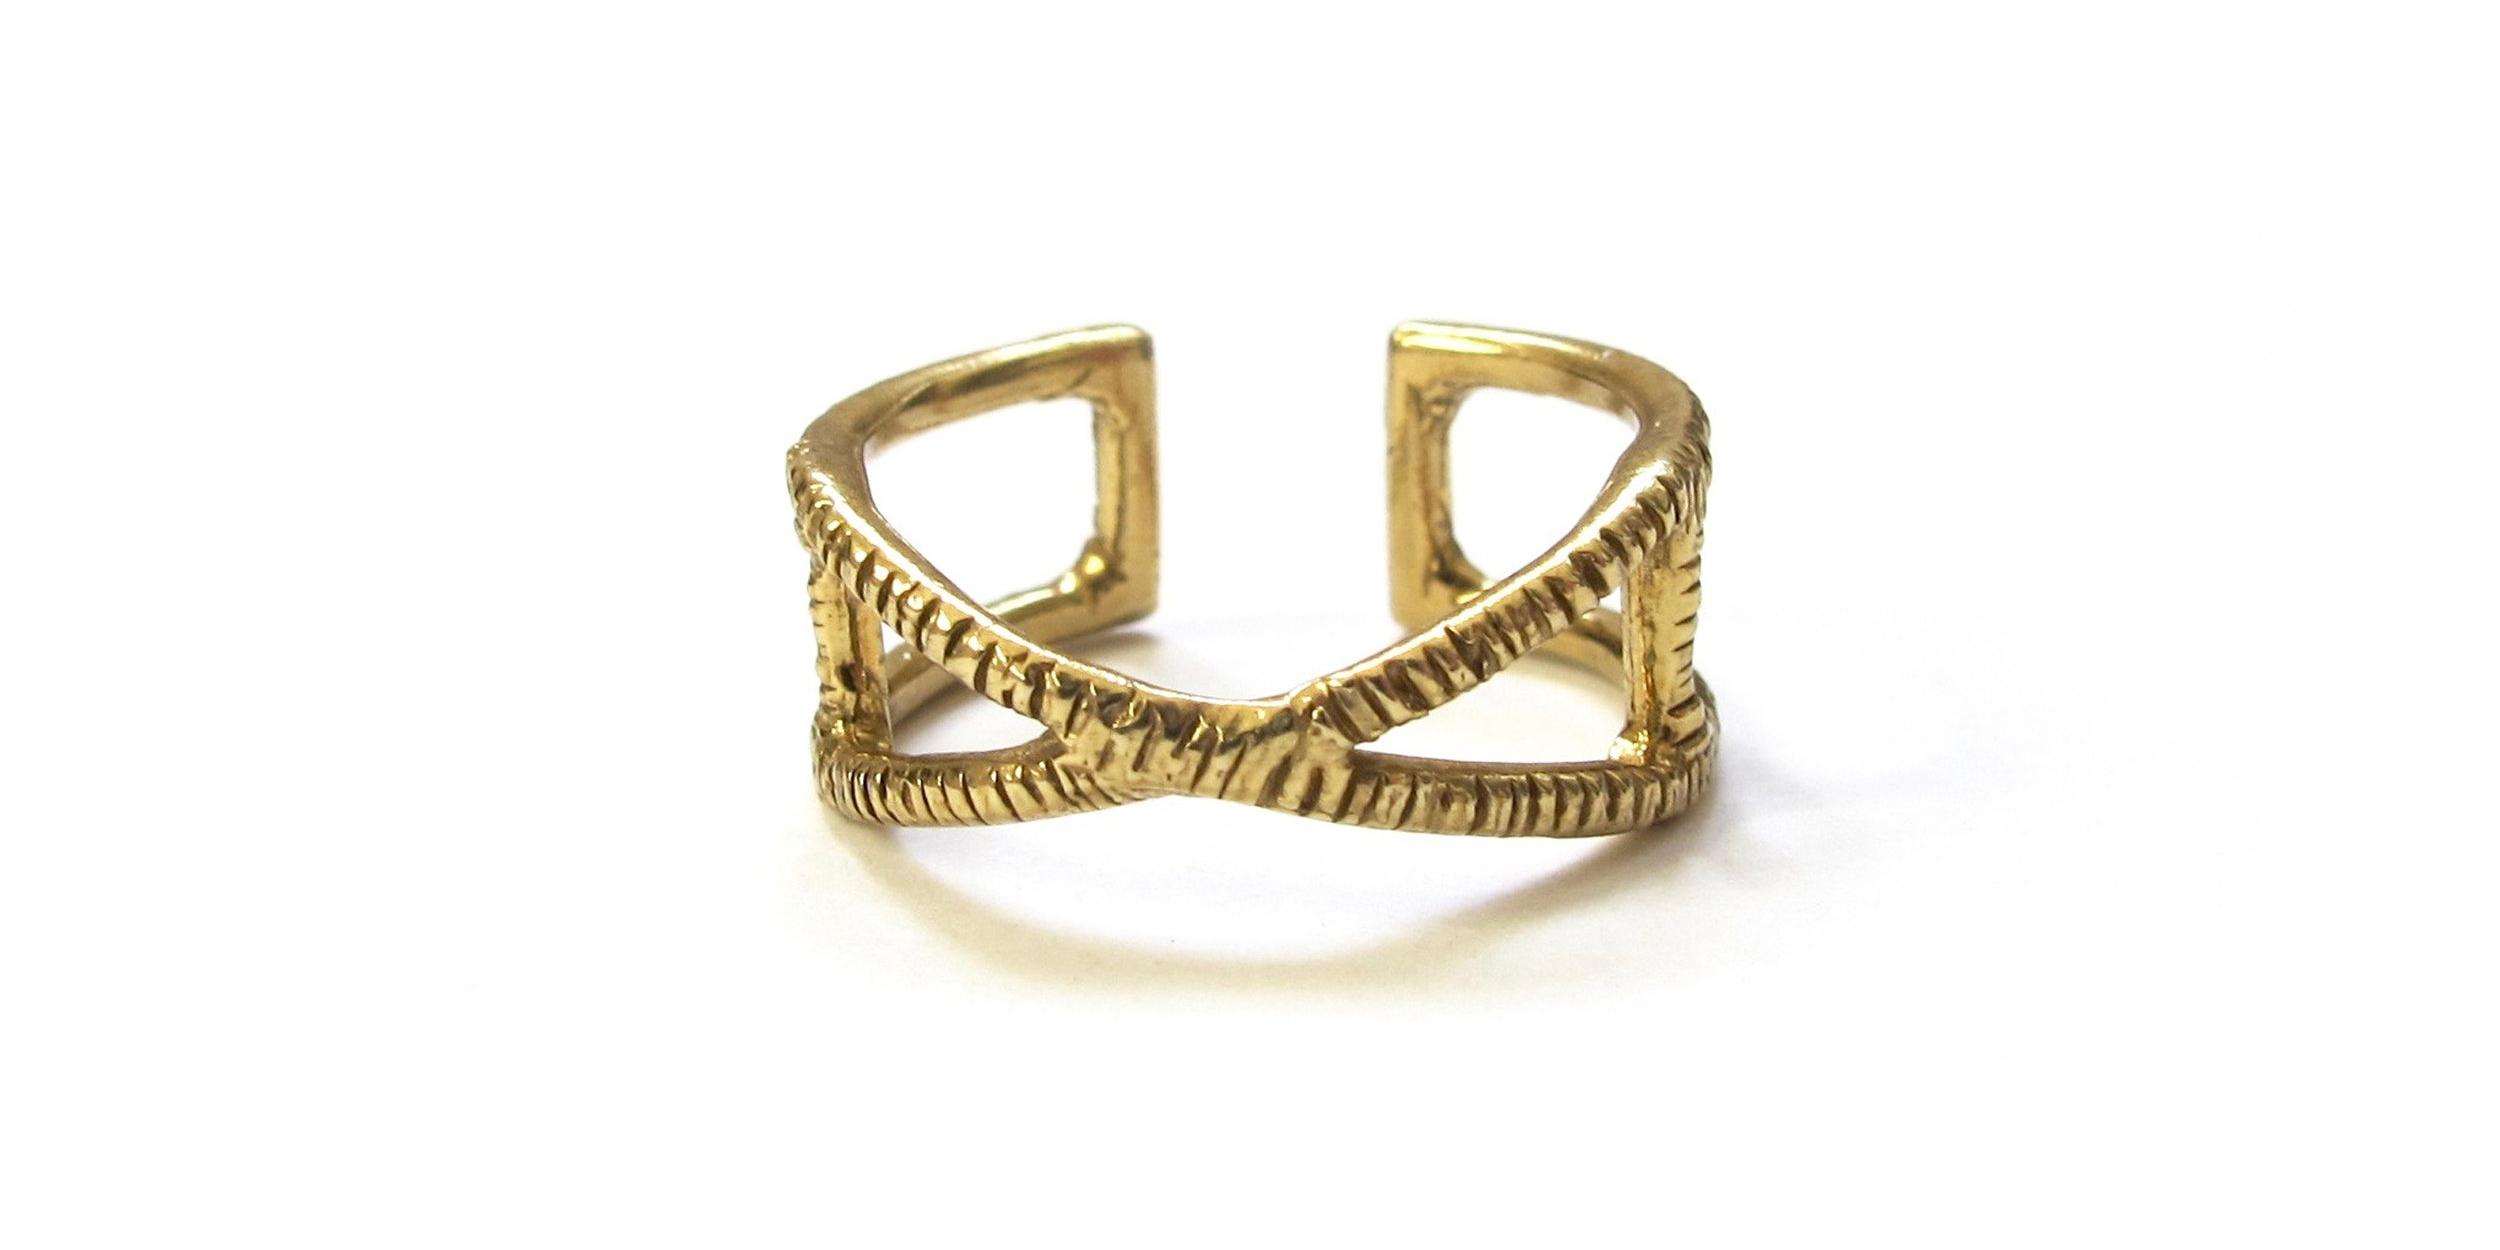 Emblem ring